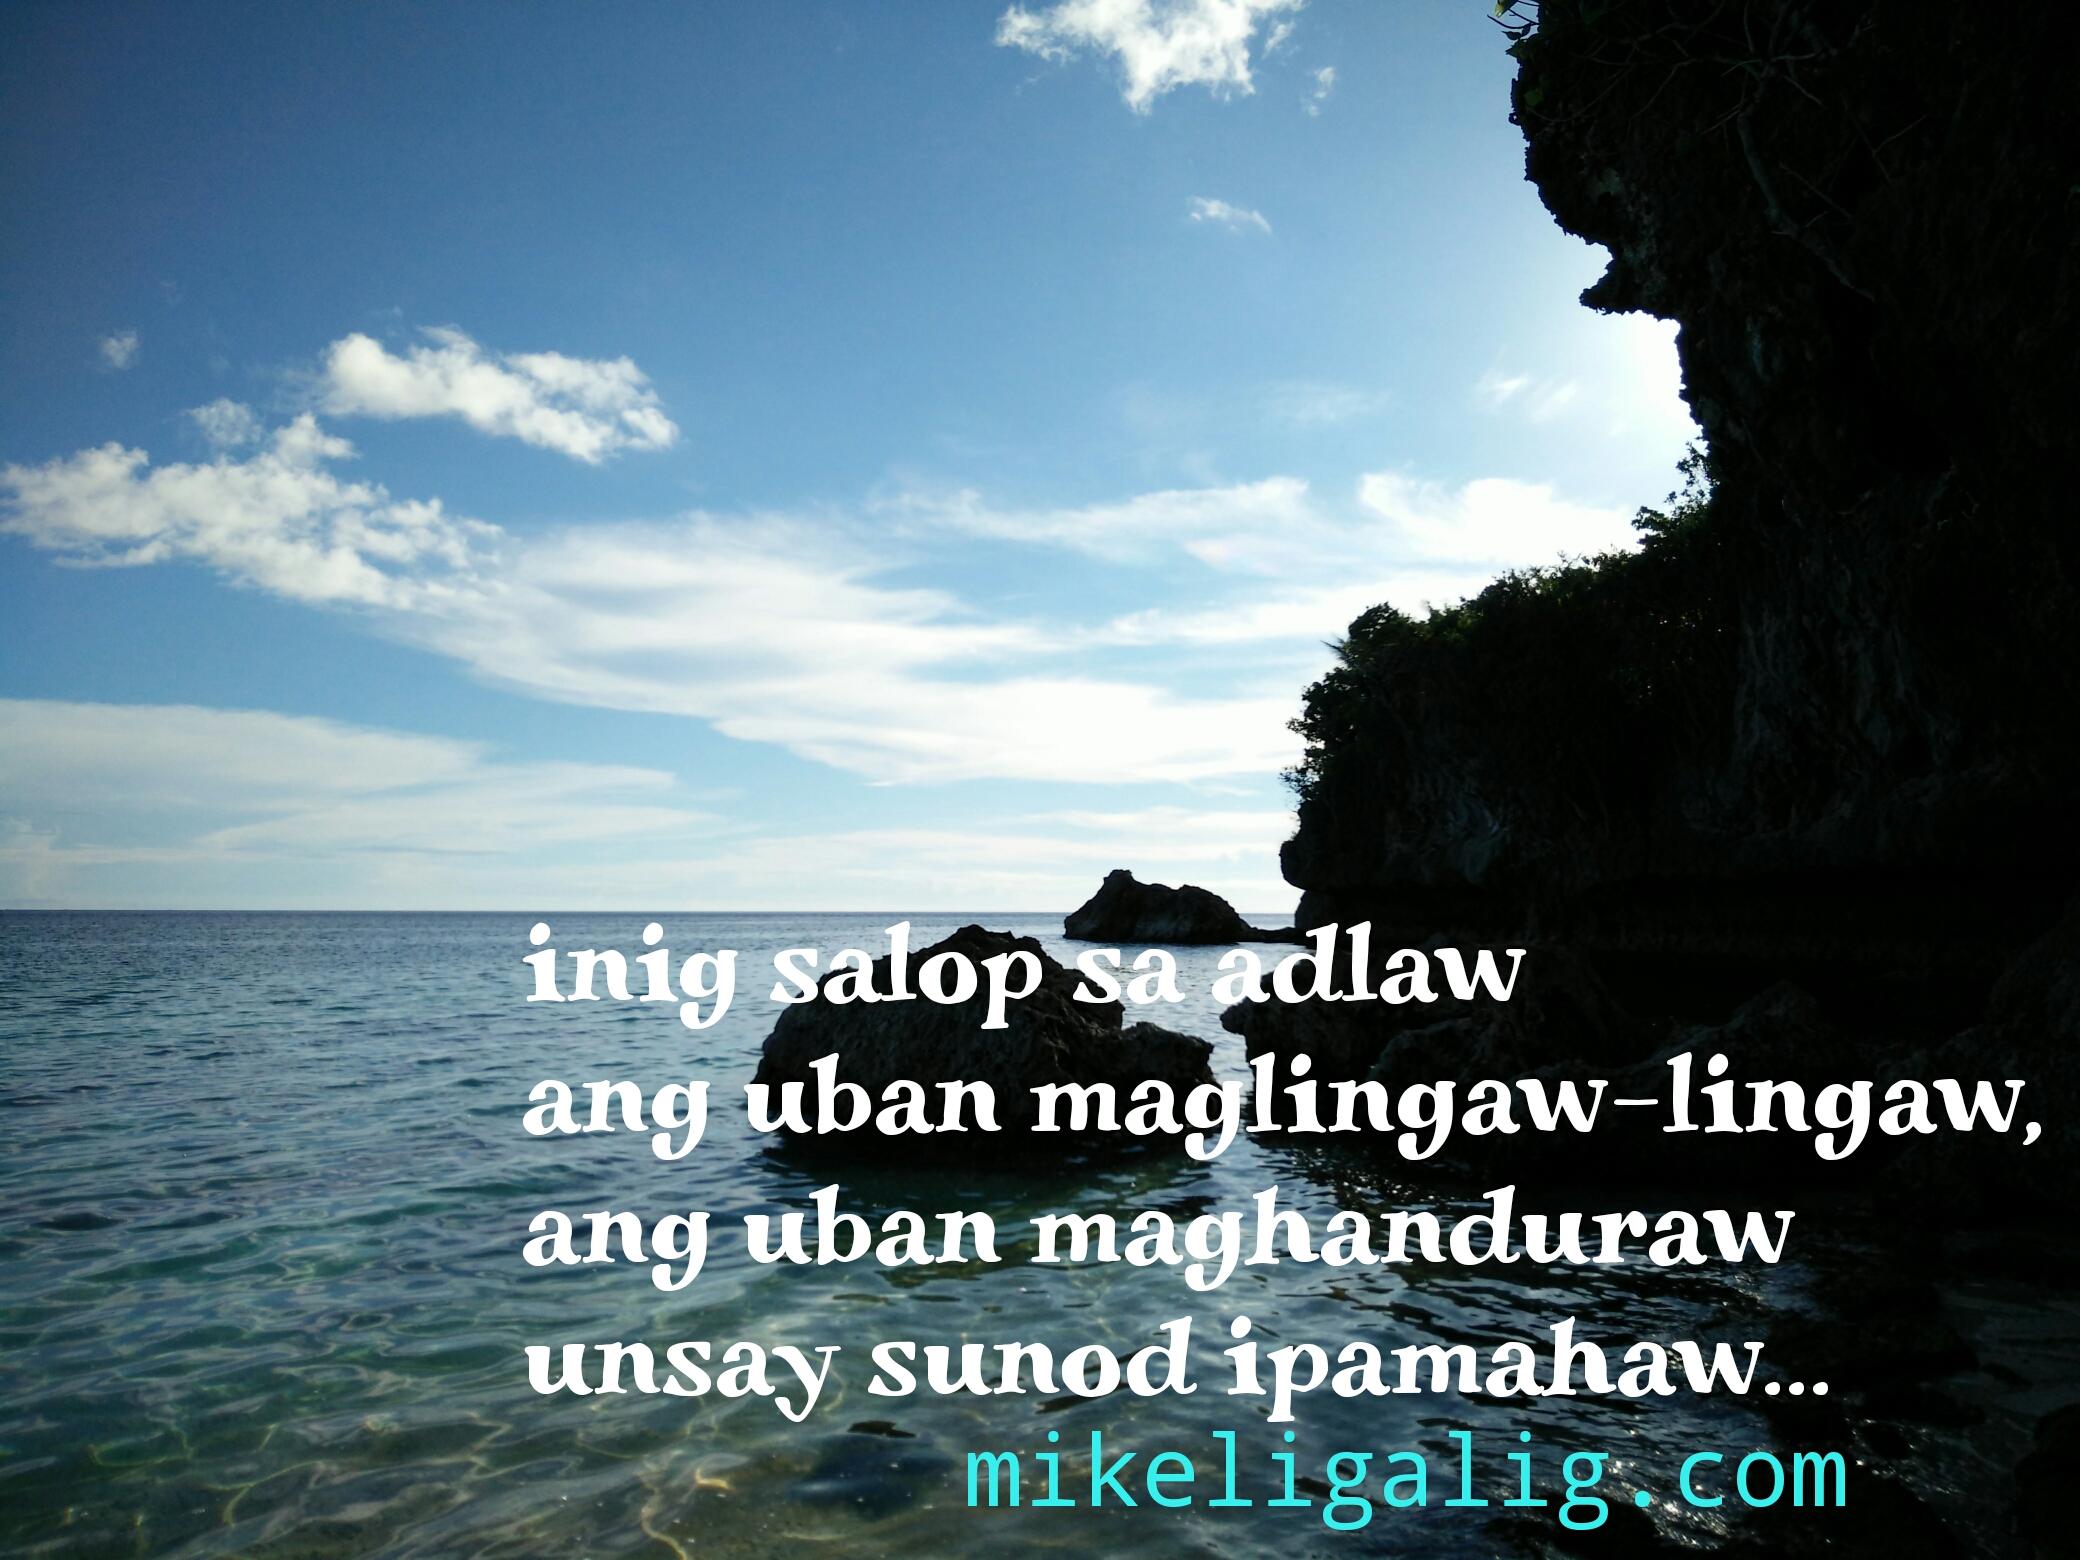 7ca12331b967a711292f3973919c5ea6 - Sunset in Anda, Bohol - Anonymous Diary Blog